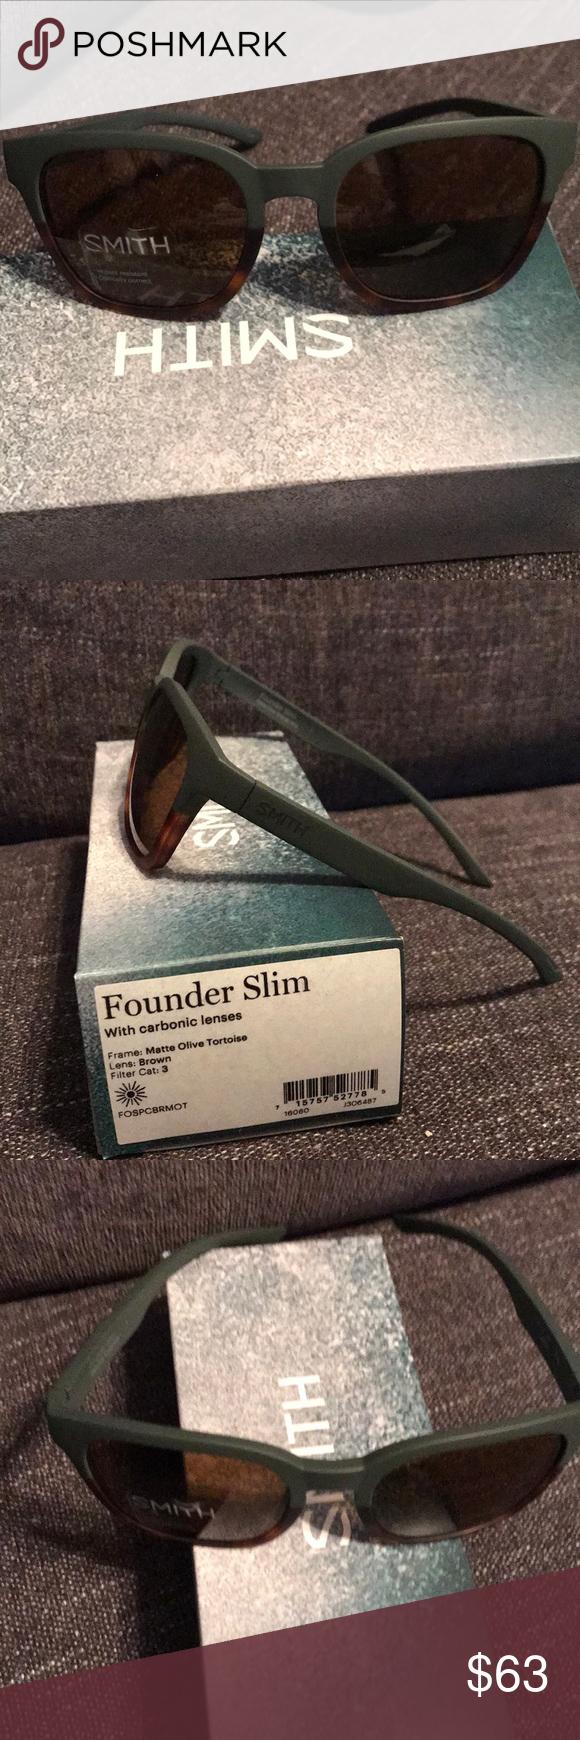 fb17538cc1da2 SMITH Optics FOUNDER SLIM Sunglasses. SMITH Optics FOUNDER slim sunglasses.  Matte olive and tortoise frame with brown carbonic lenses.